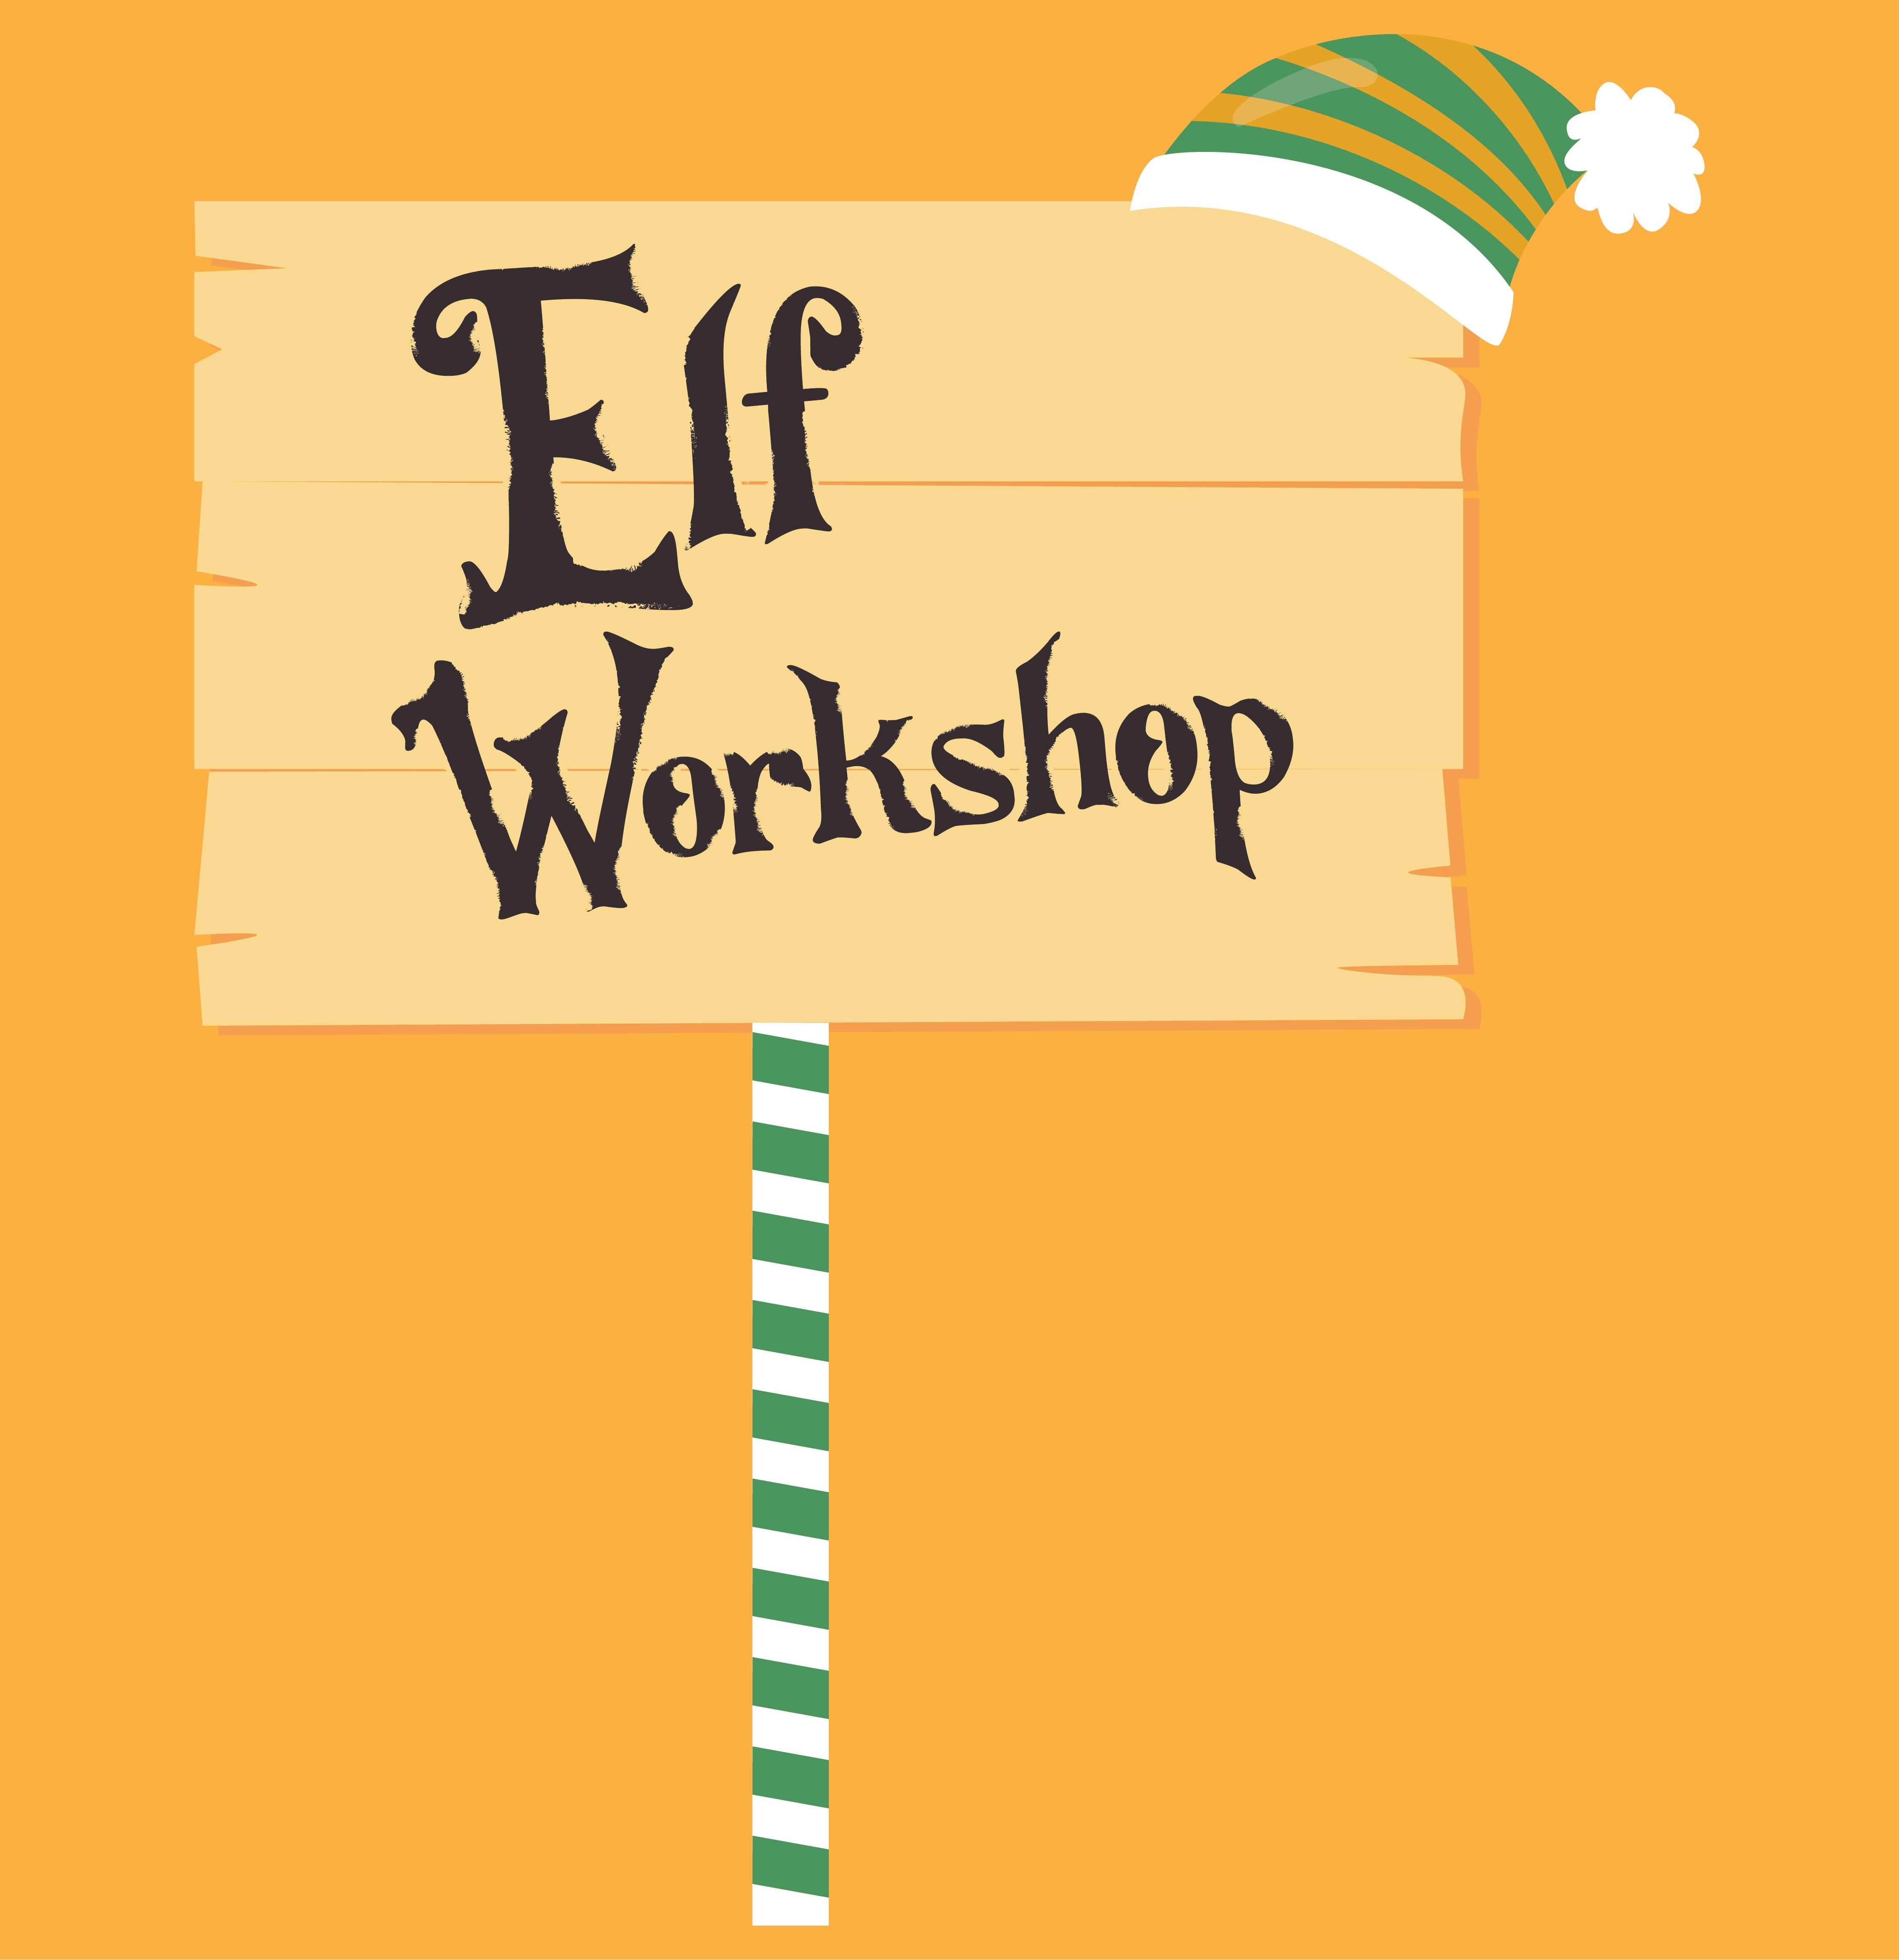 Christmas Elves Workshop Sign Printable